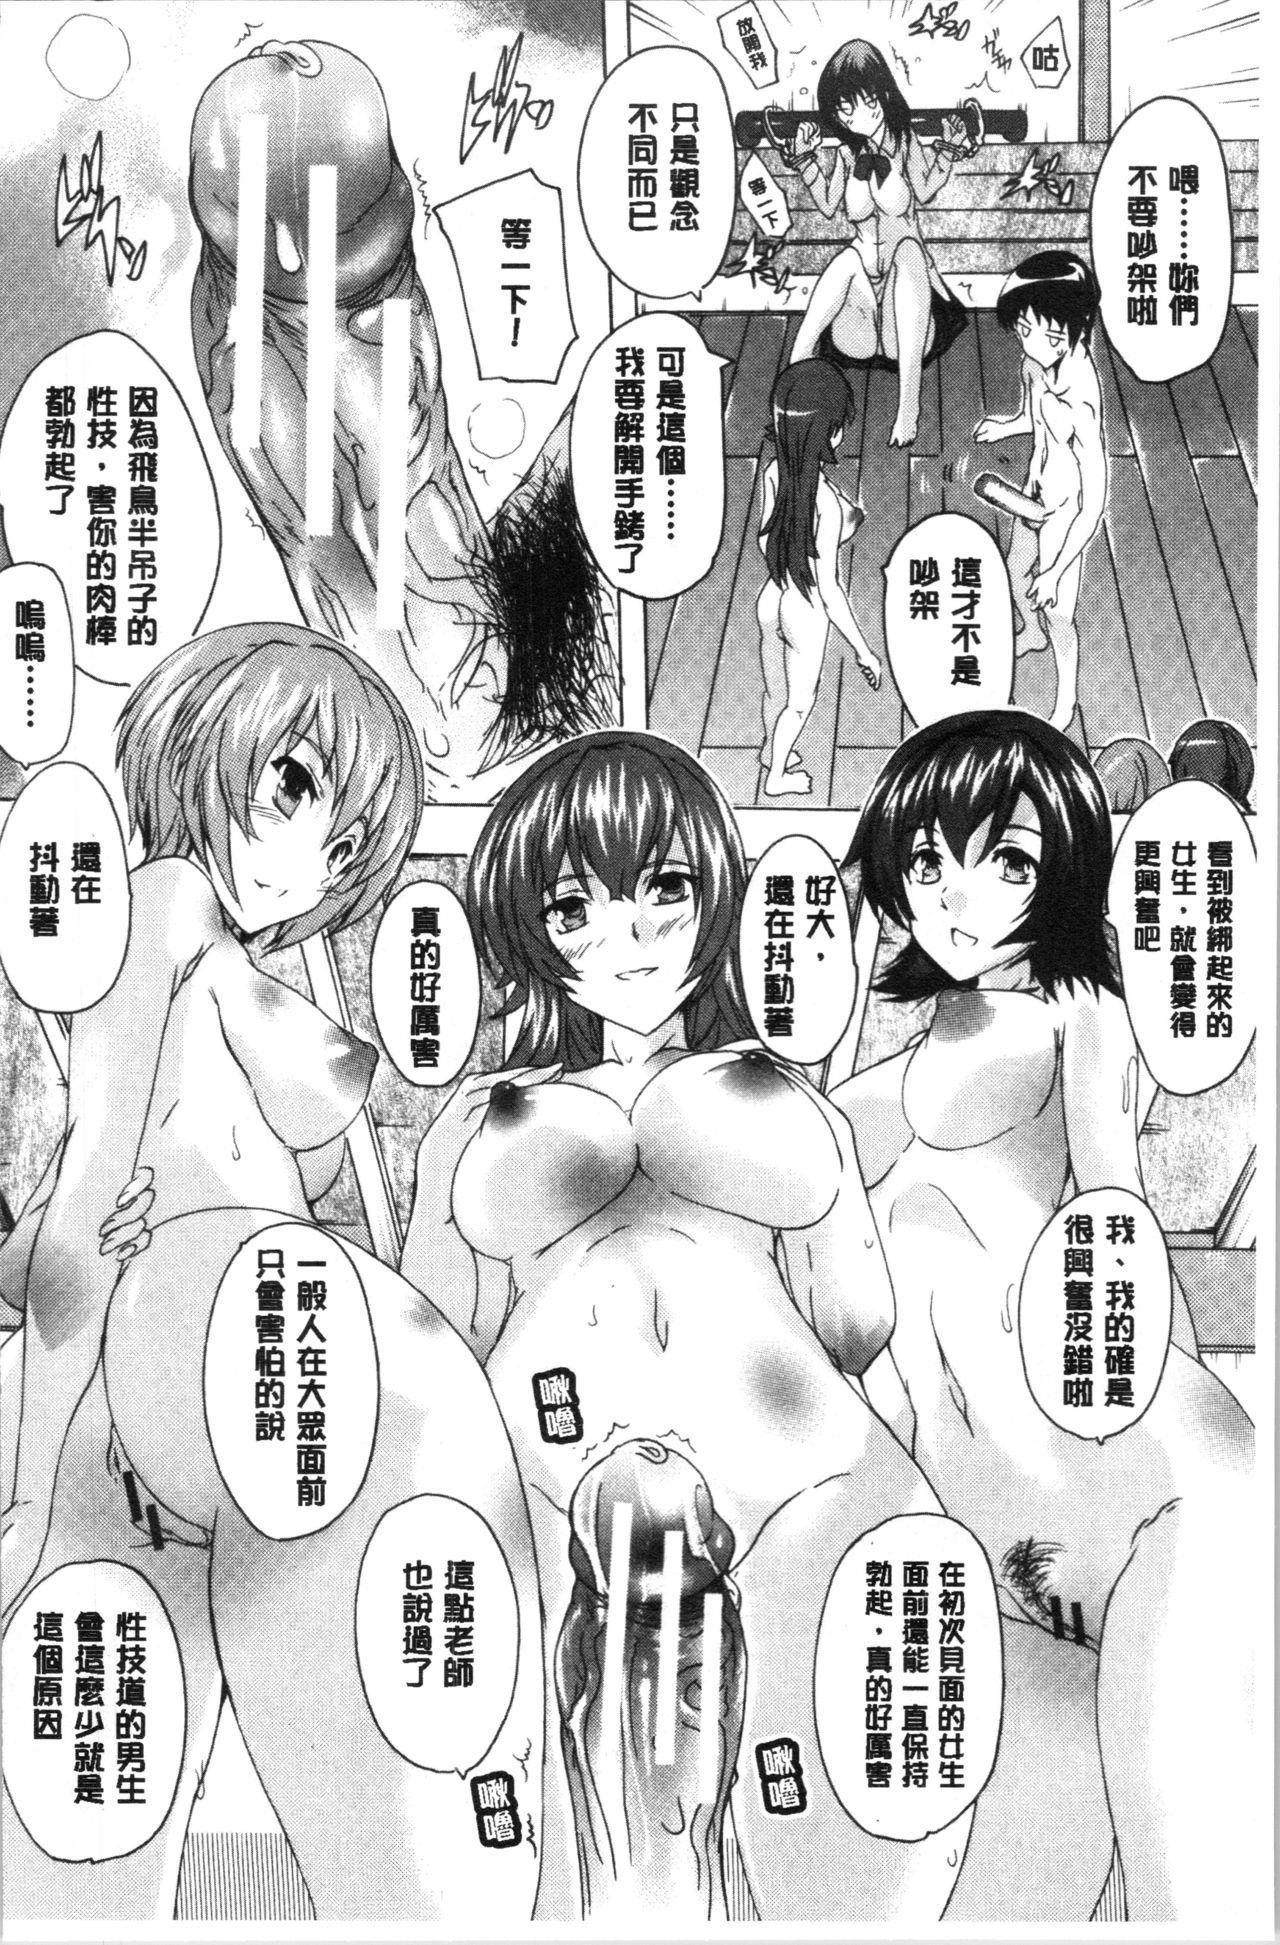 [Natsuka Q-Ya] Hisshuu!! Sex-bu - SEIGI-DO The Ultimate Martial Arts   必修!!性愛淫交部 [Chinese] 80